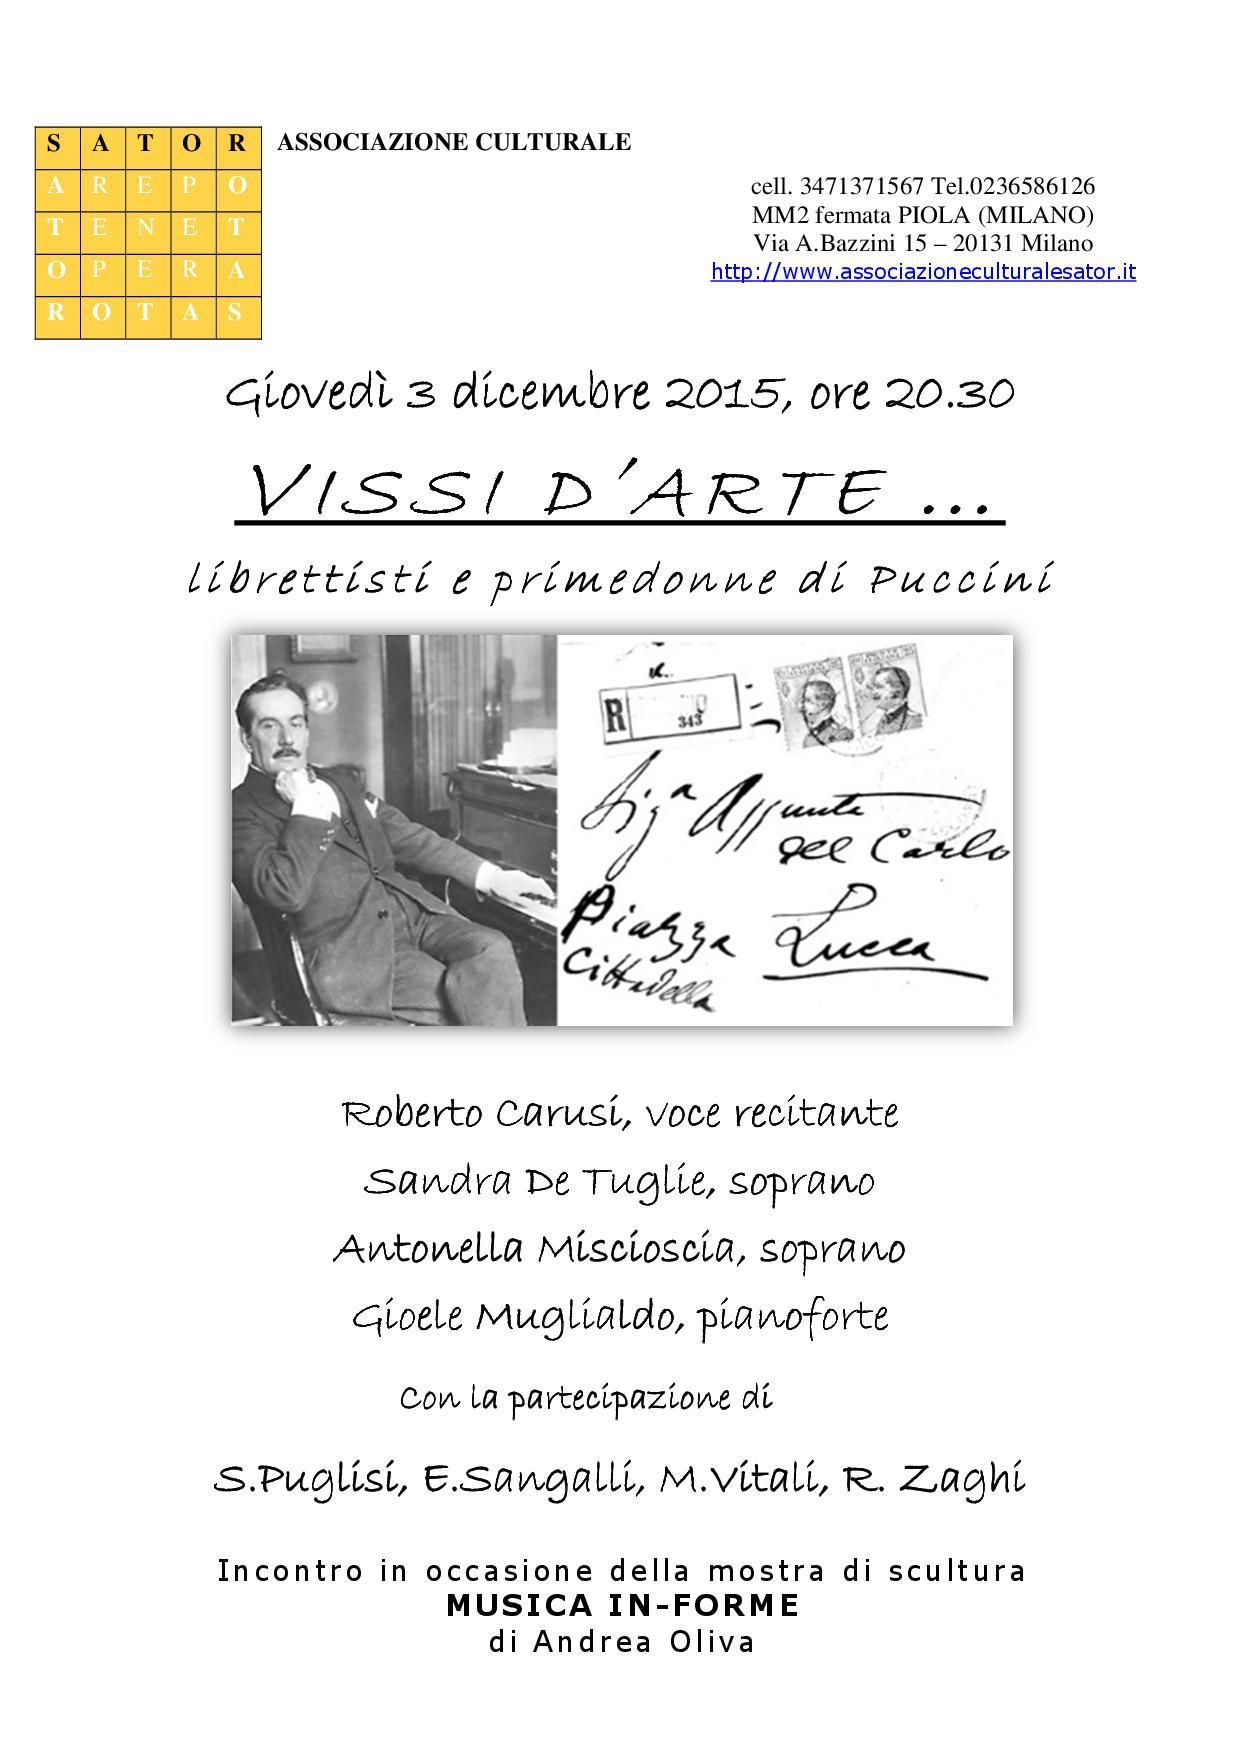 VISSI D'ARTE_locandina-001